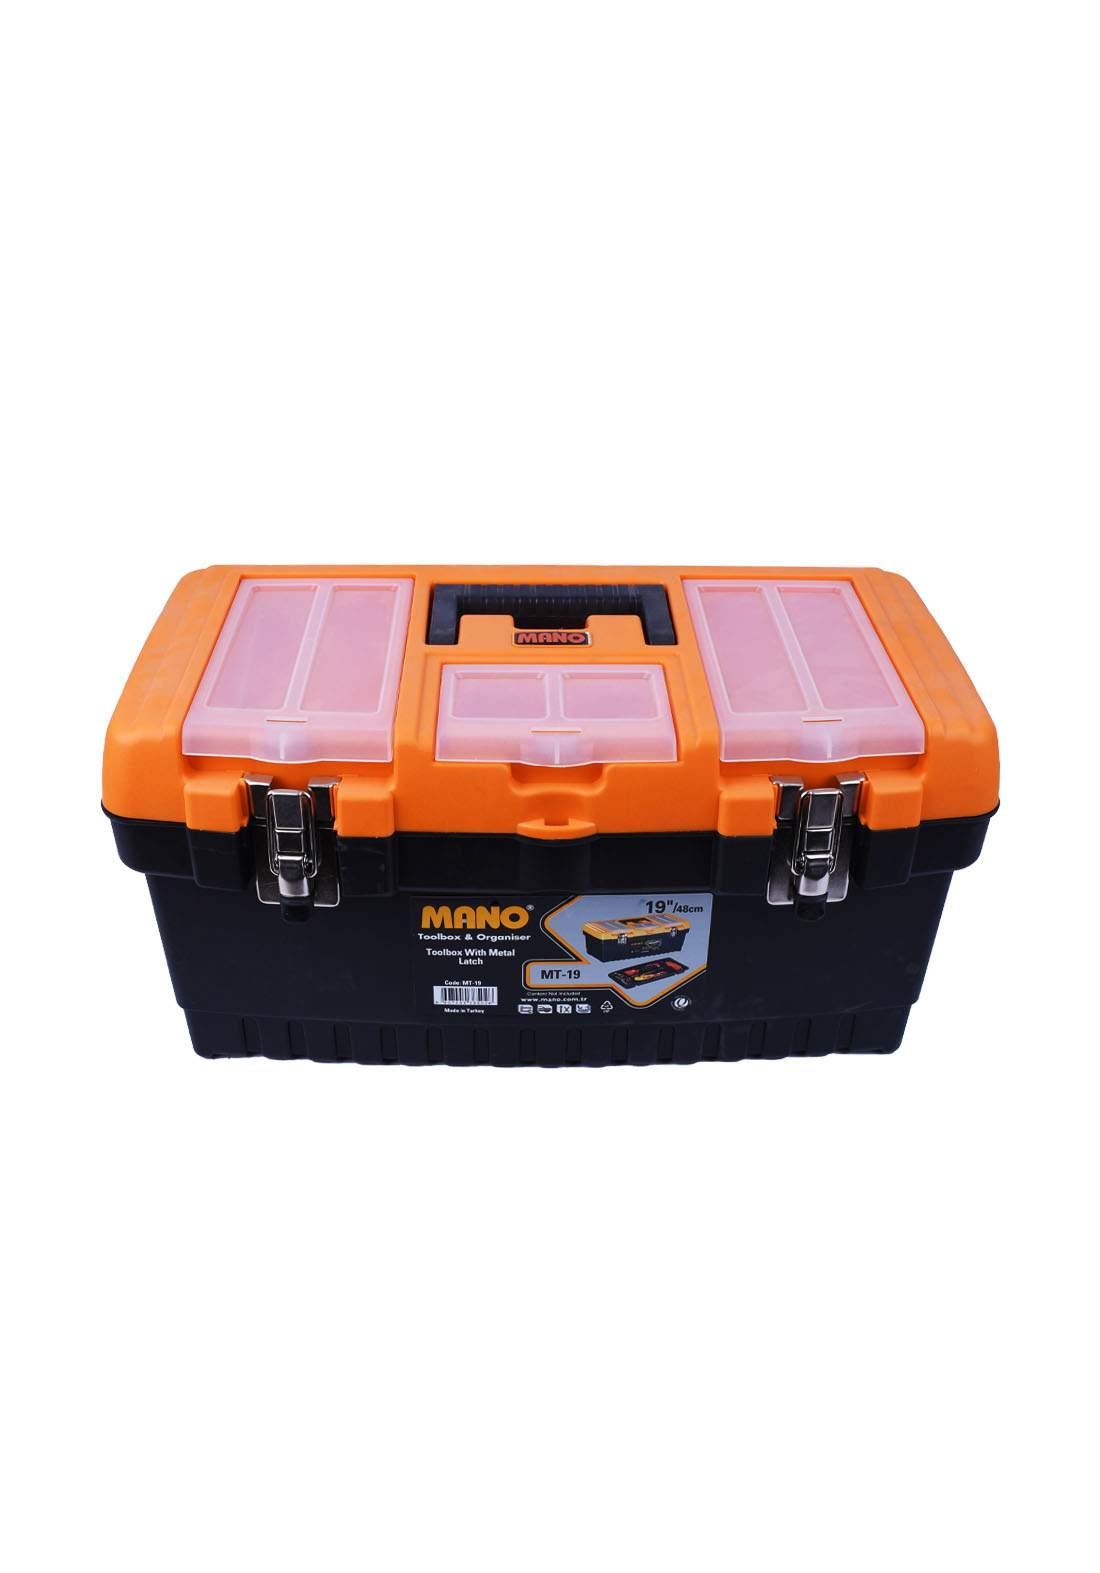 "Mano MT-19 19""/48cm Toolbox With Metal Latch حقيبة عدد يدوية"